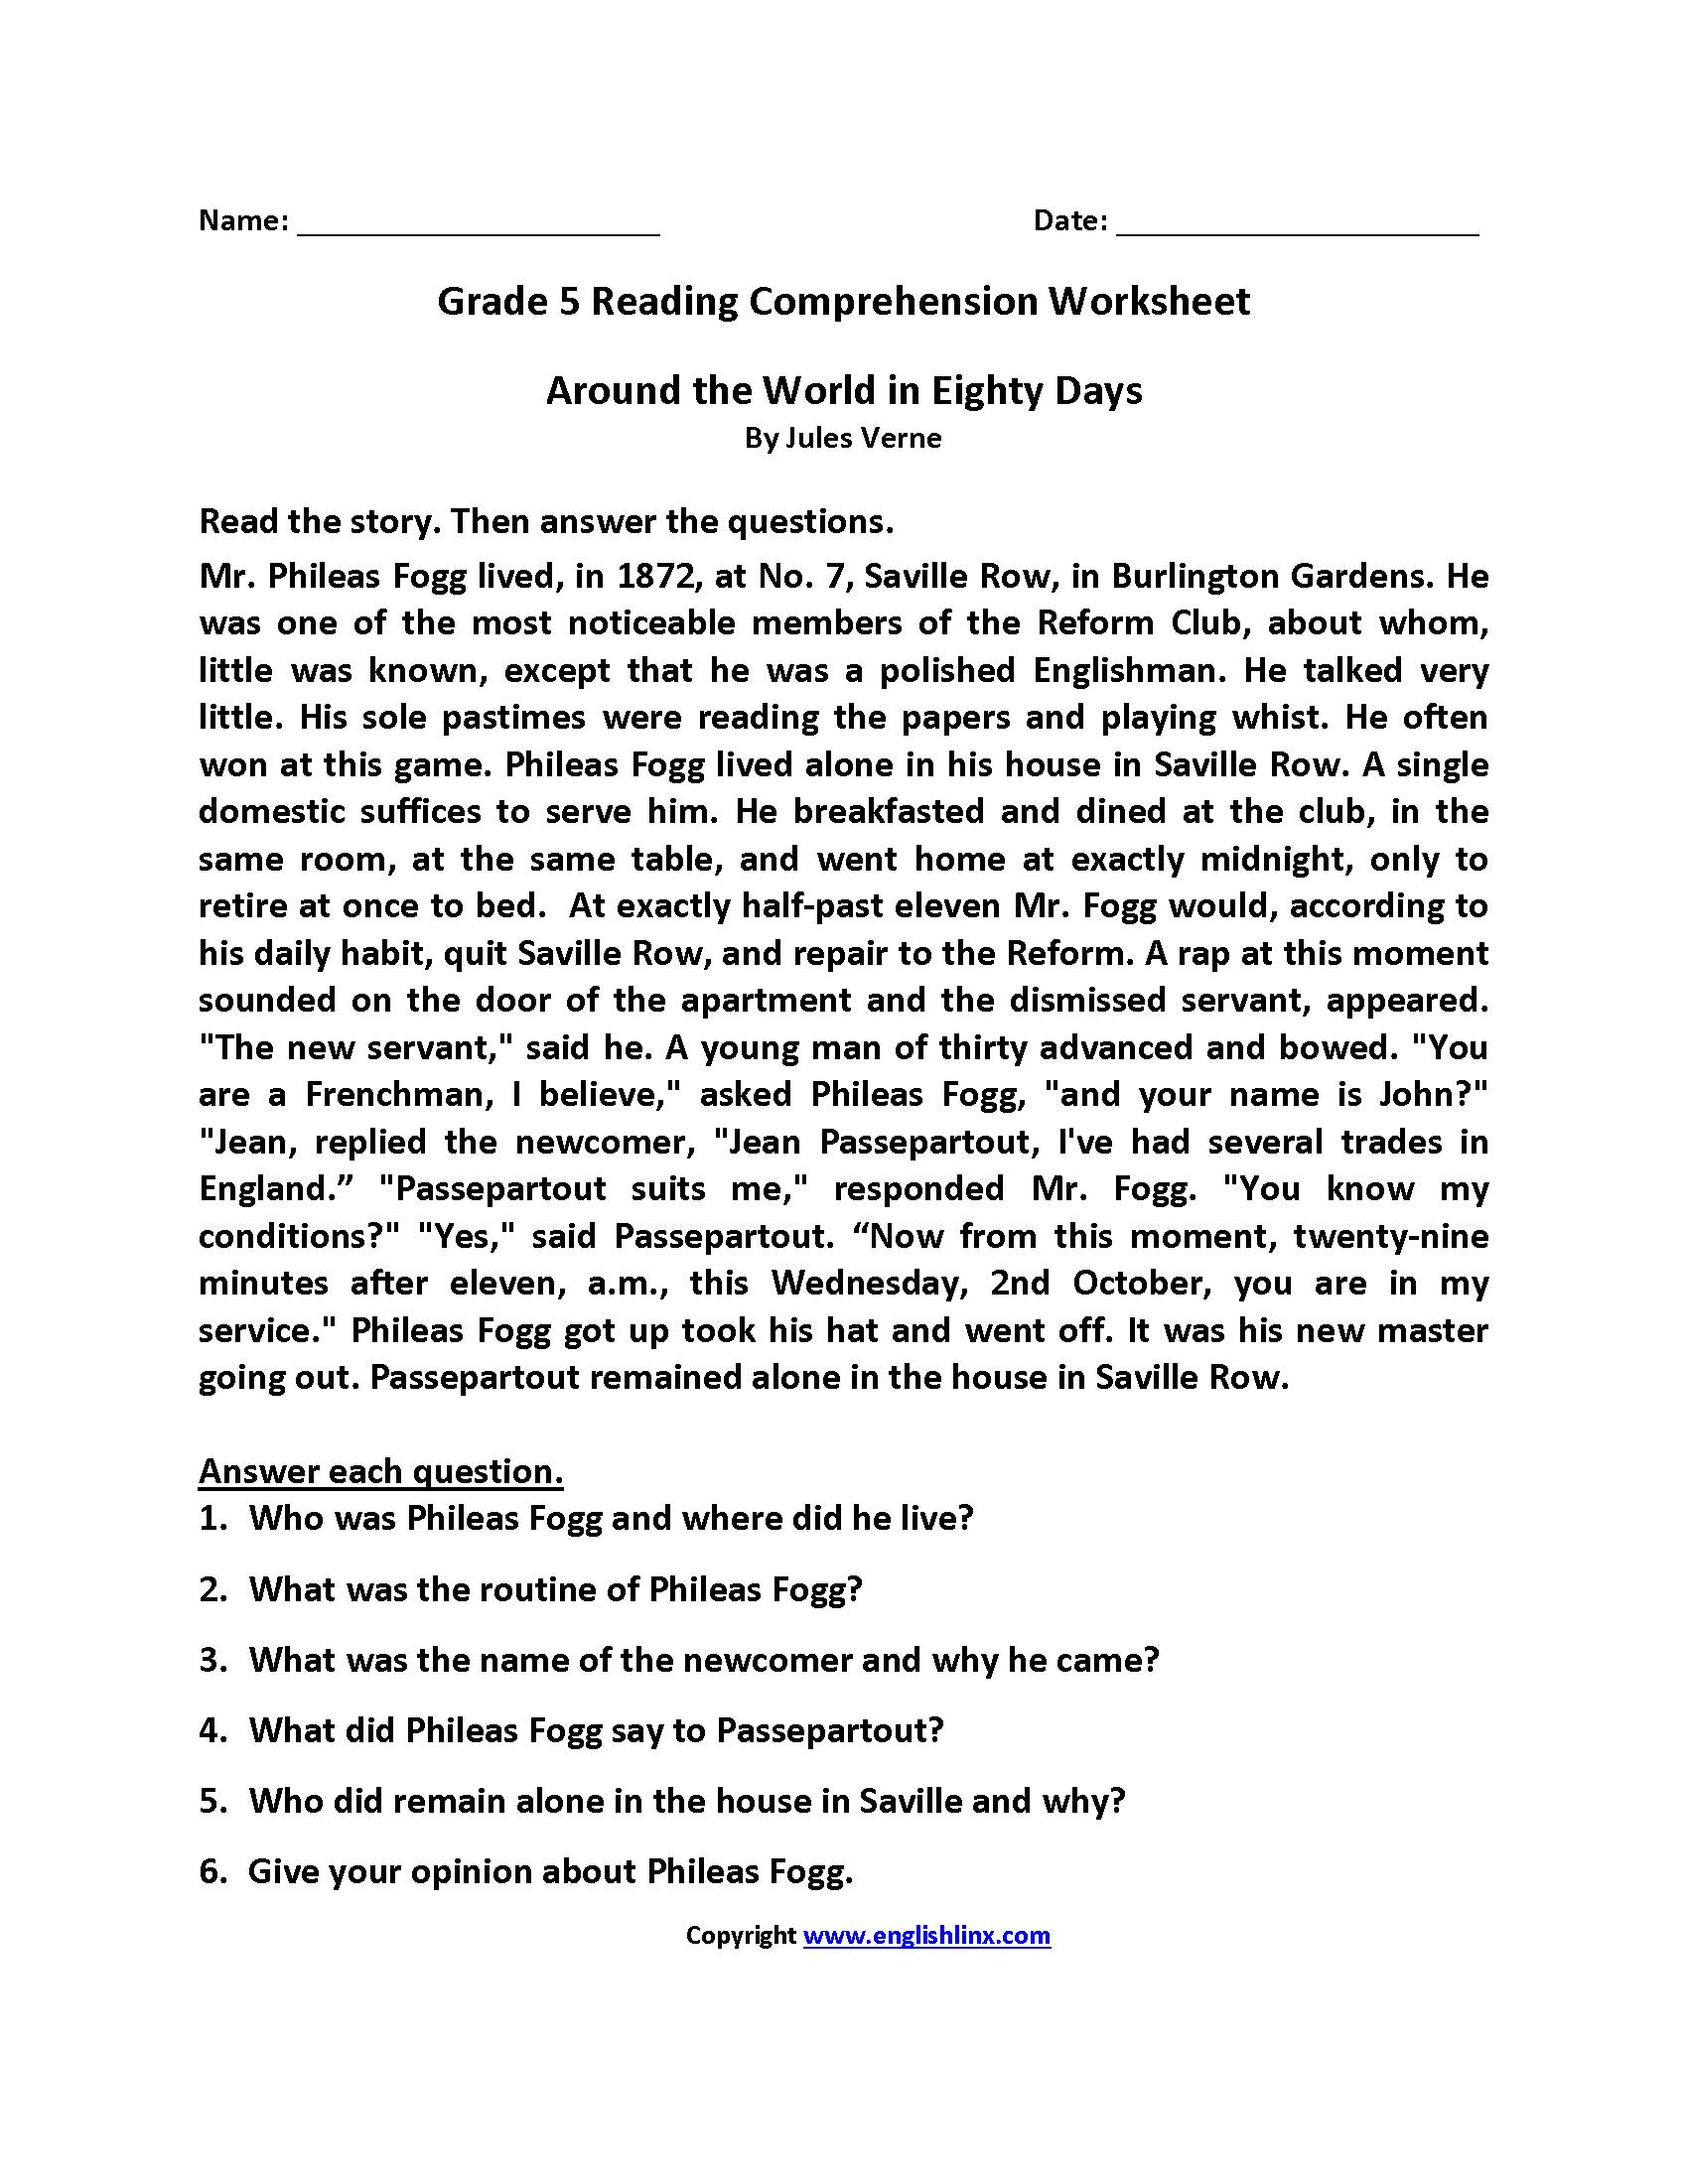 Reading Worksheets  Fifth Grade Reading Worksheets Inside Reading Comprehension Worksheets 5Th Grade